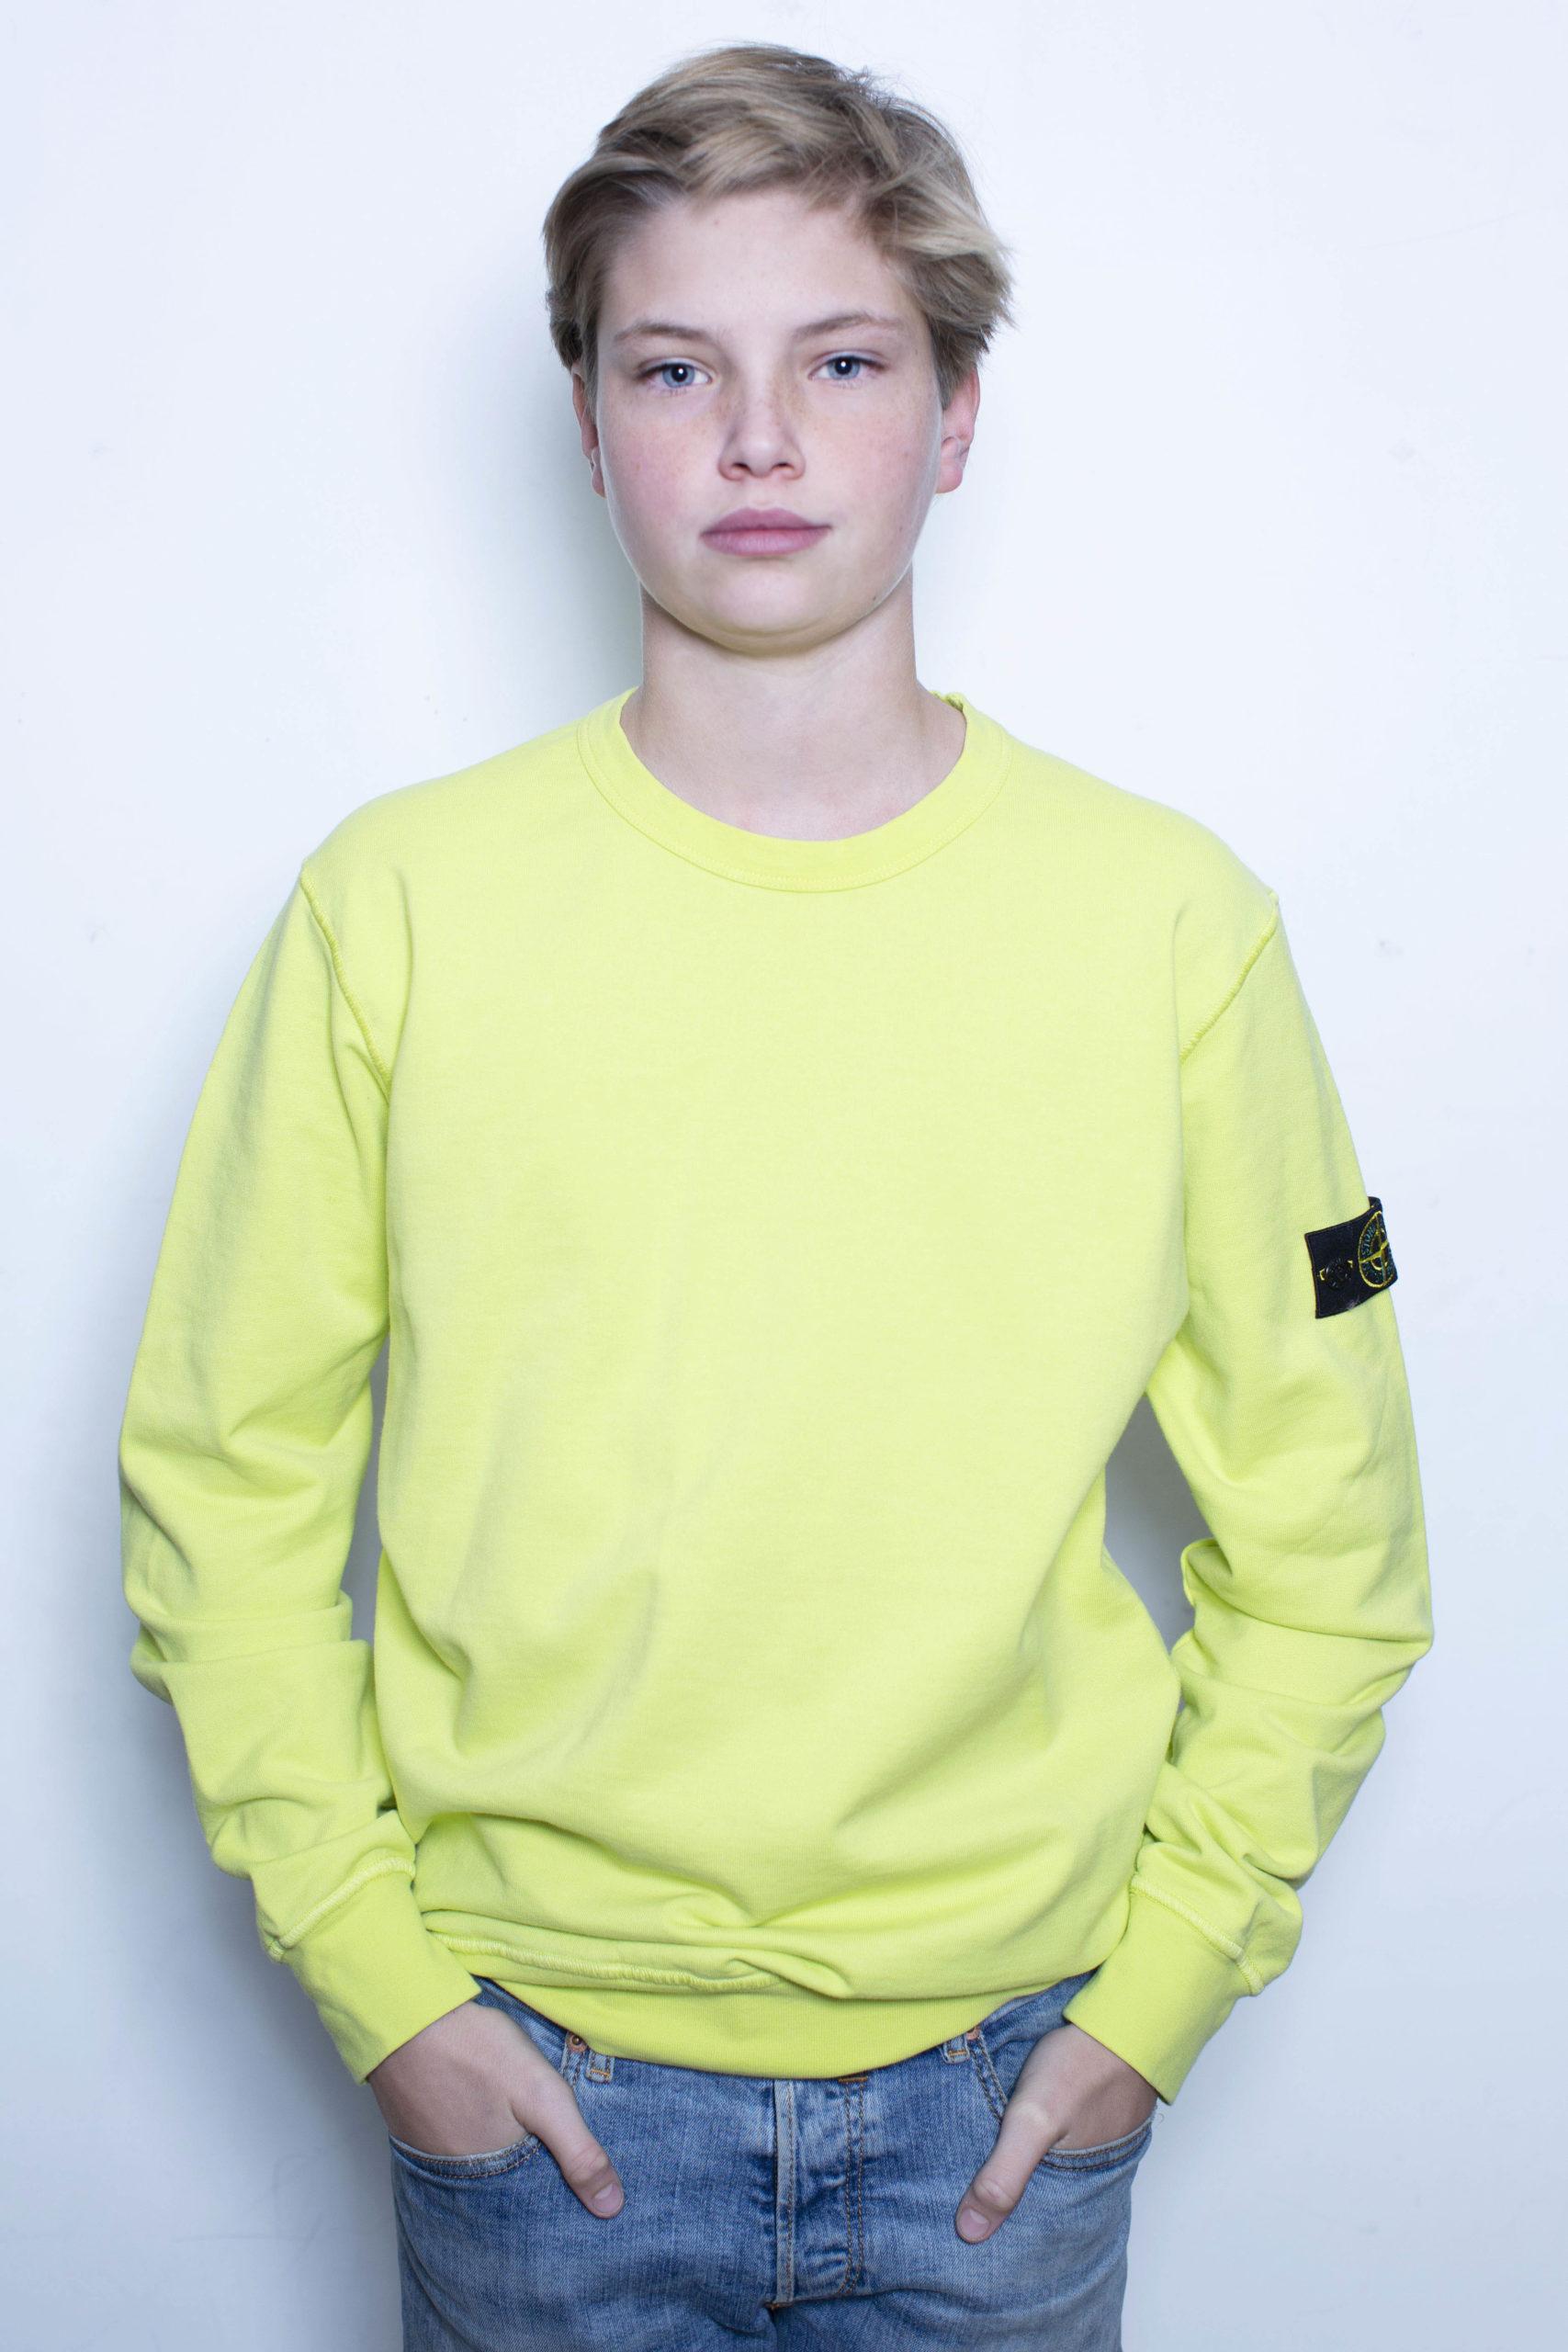 Stone Island sweater lime